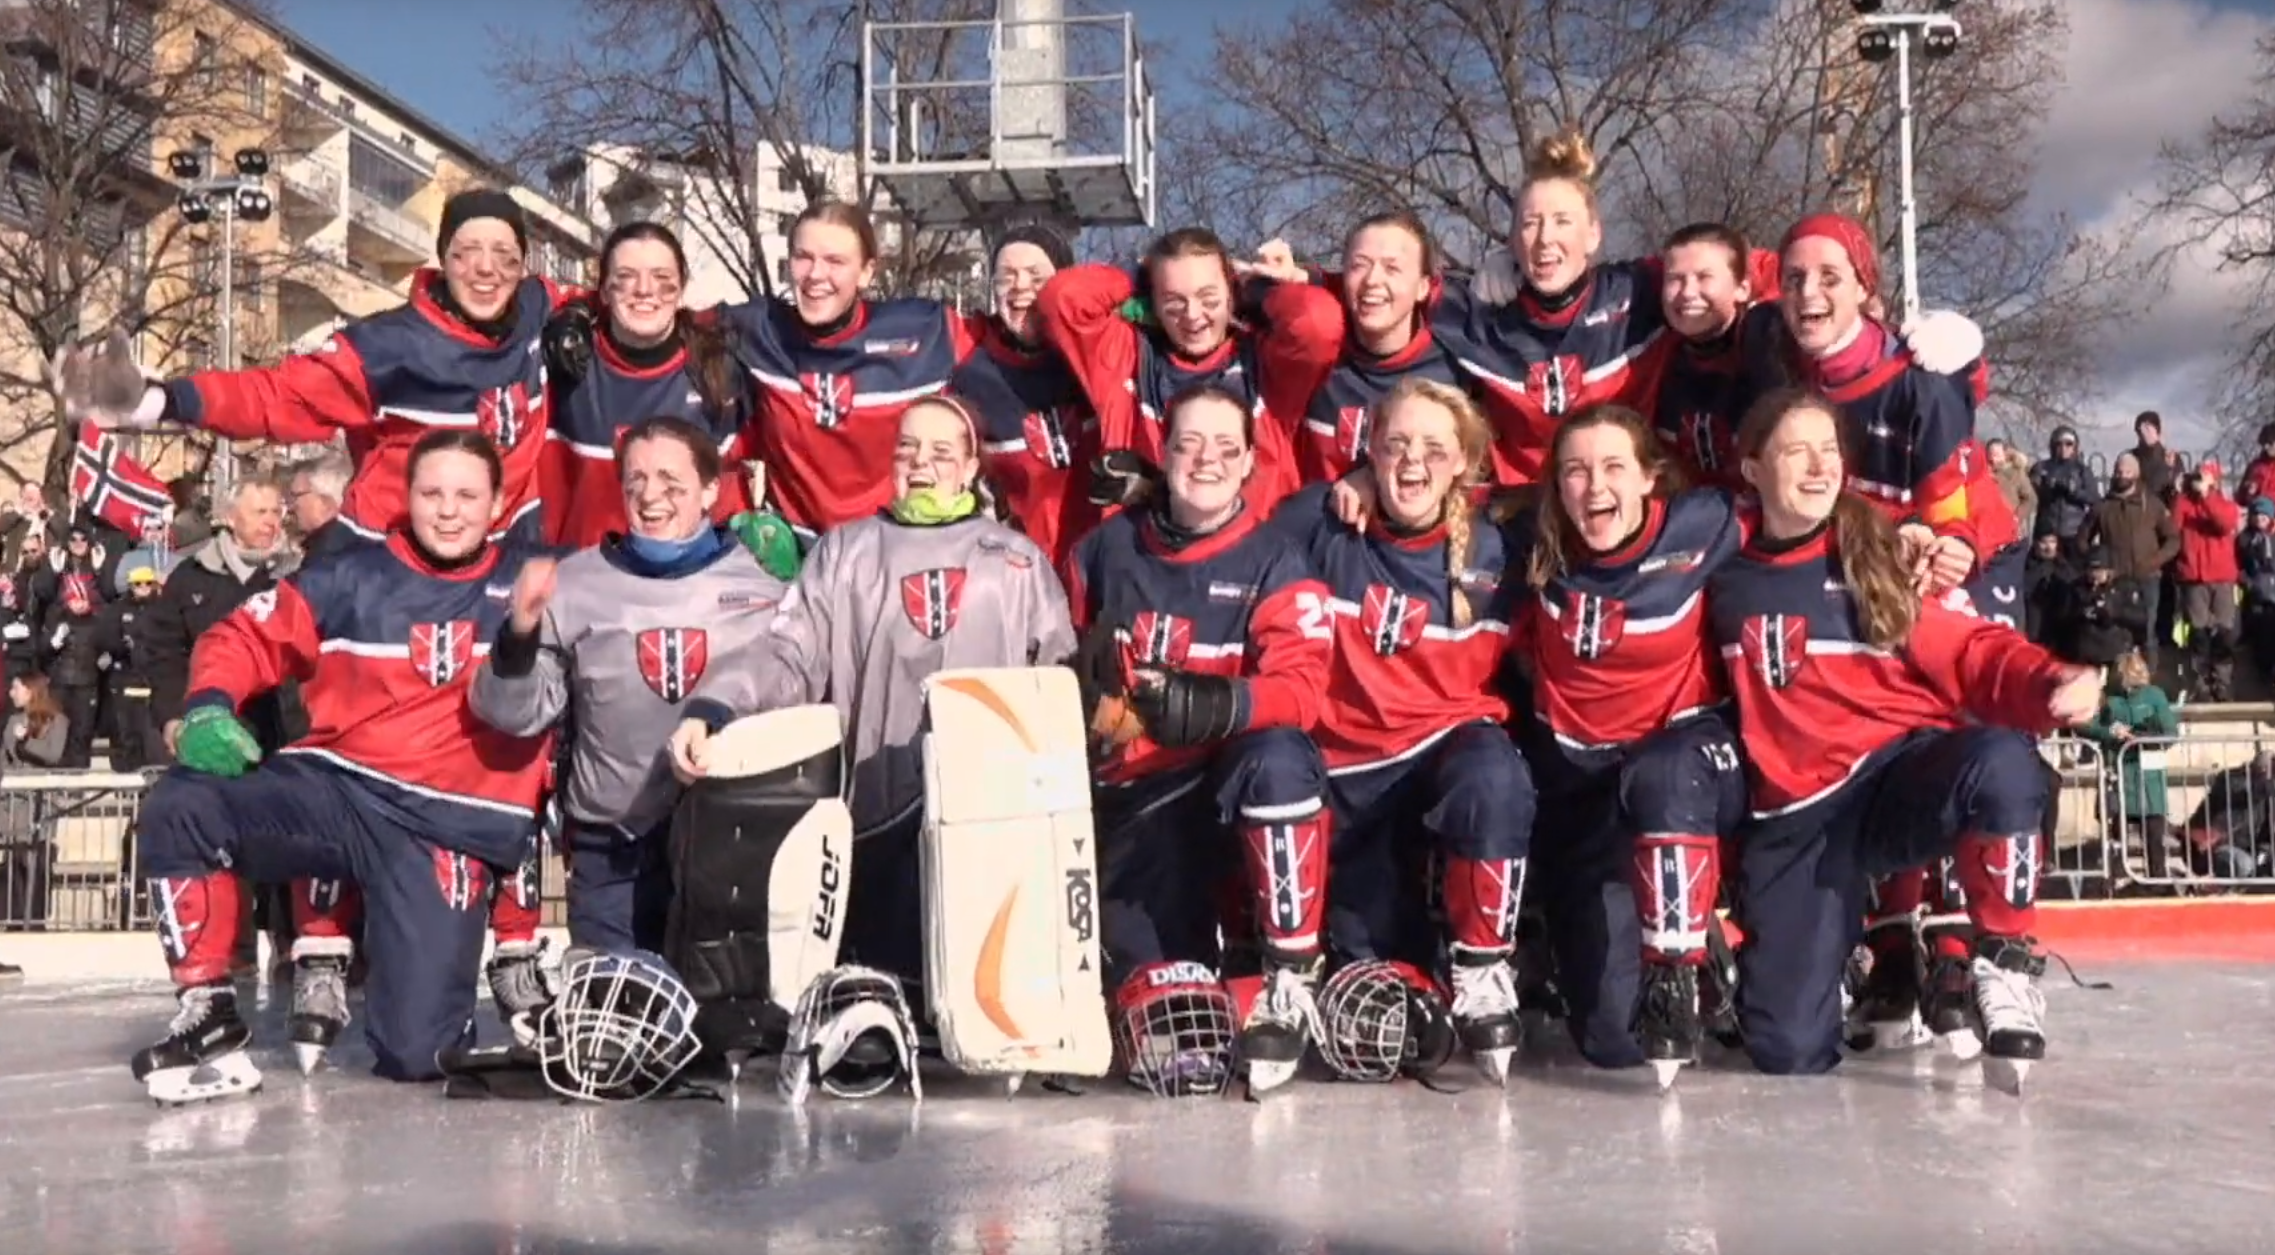 De norske jentene sikret VM-bronsen